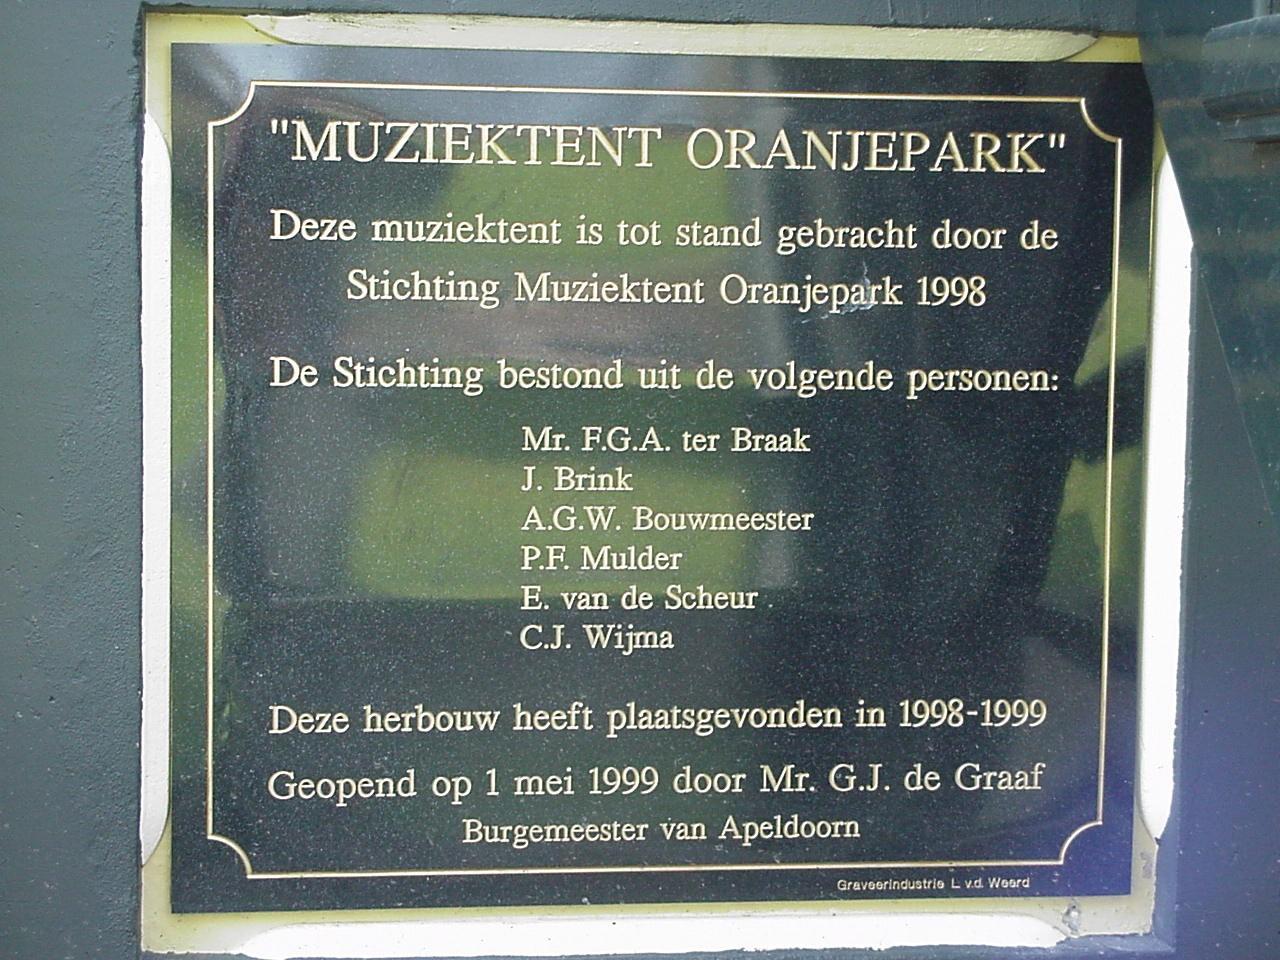 muziektent tegel oprichting 1998